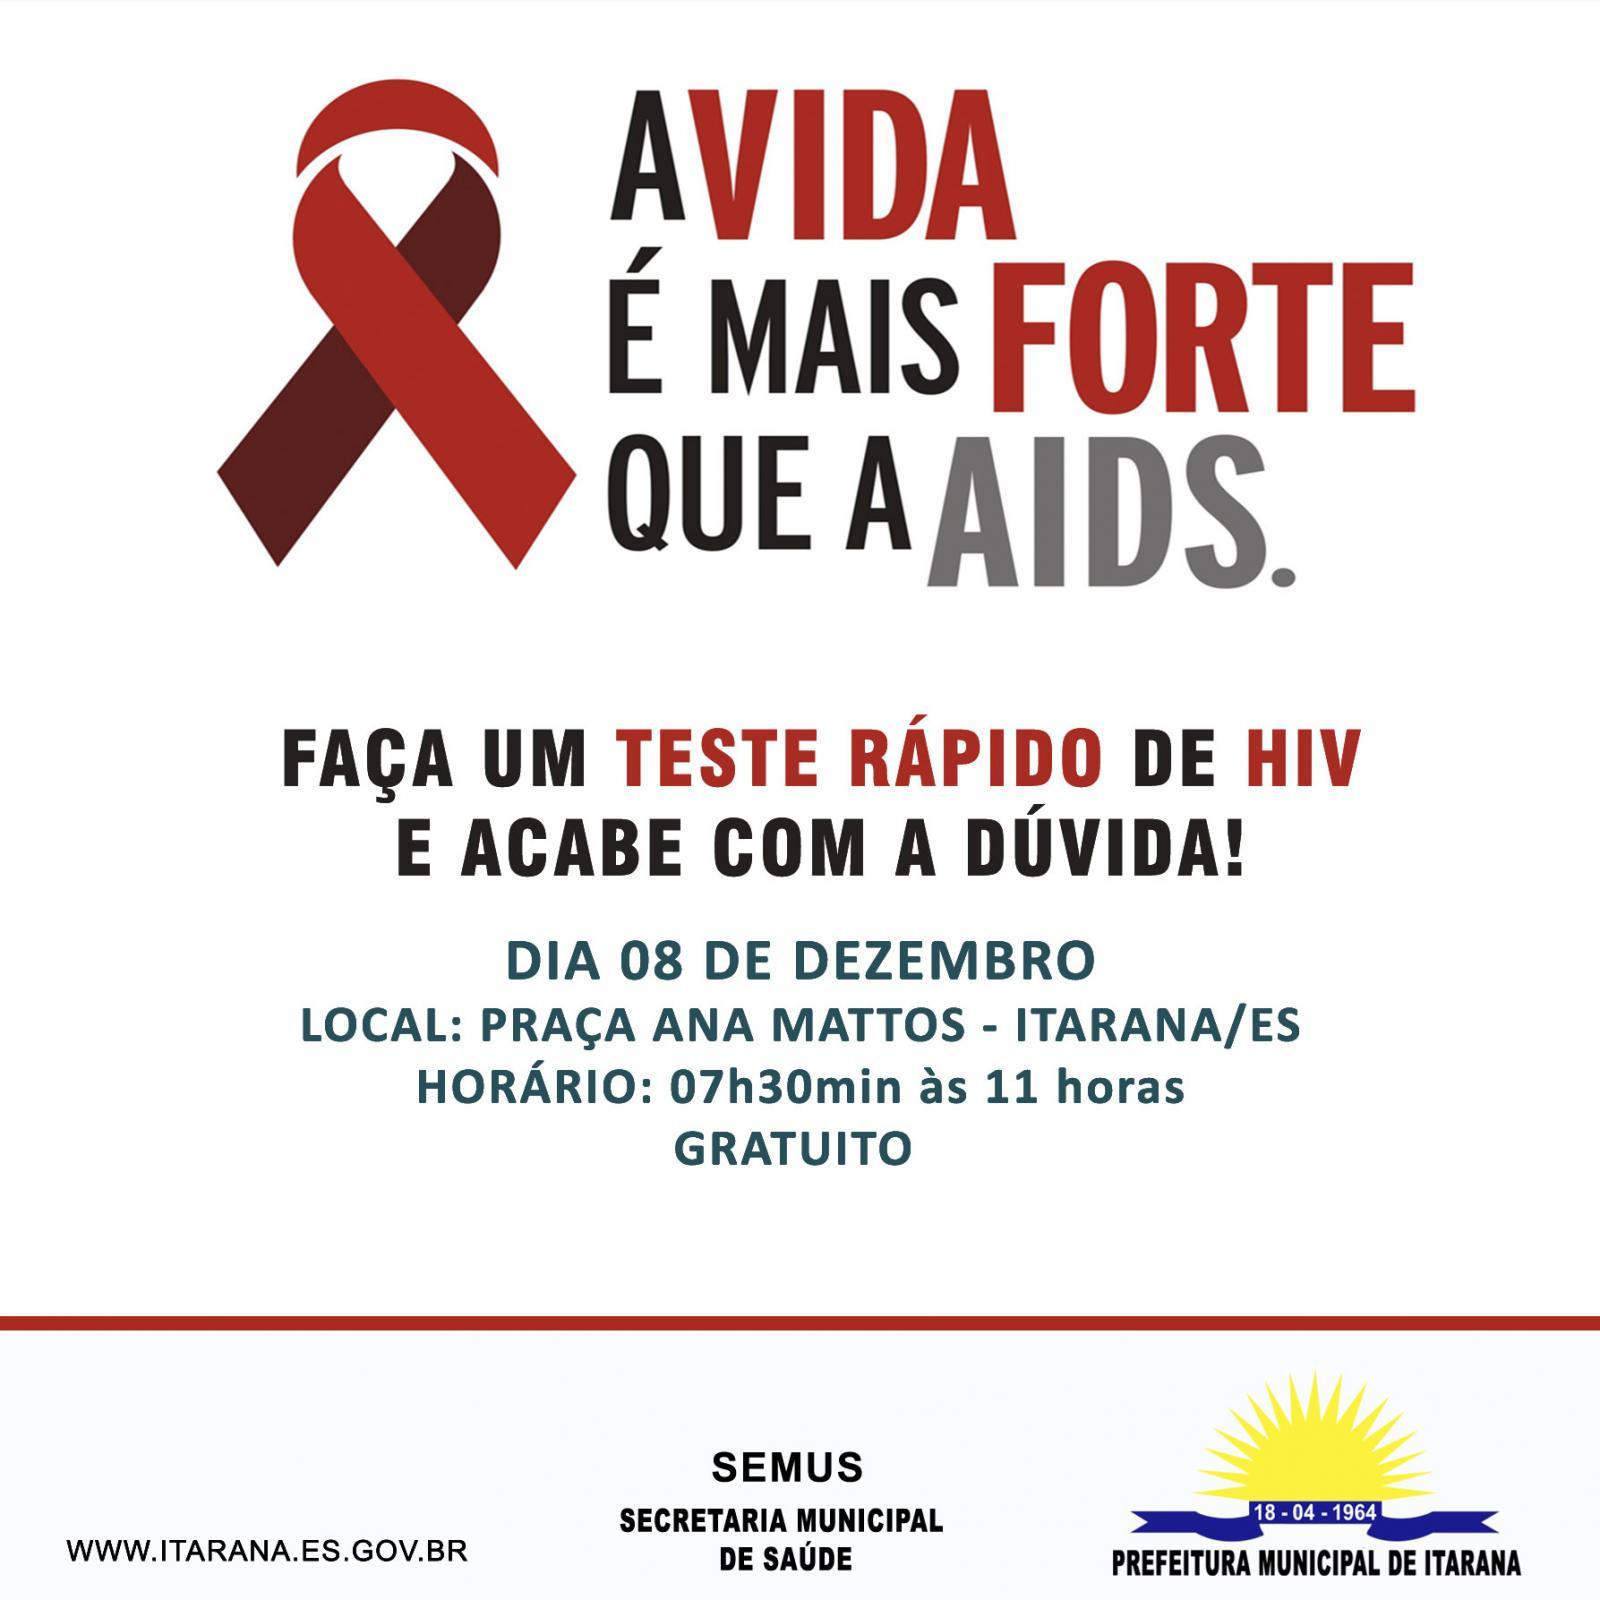 Saúde vai oferecer testes rápidos de HIV, nesta sexta, dia 08